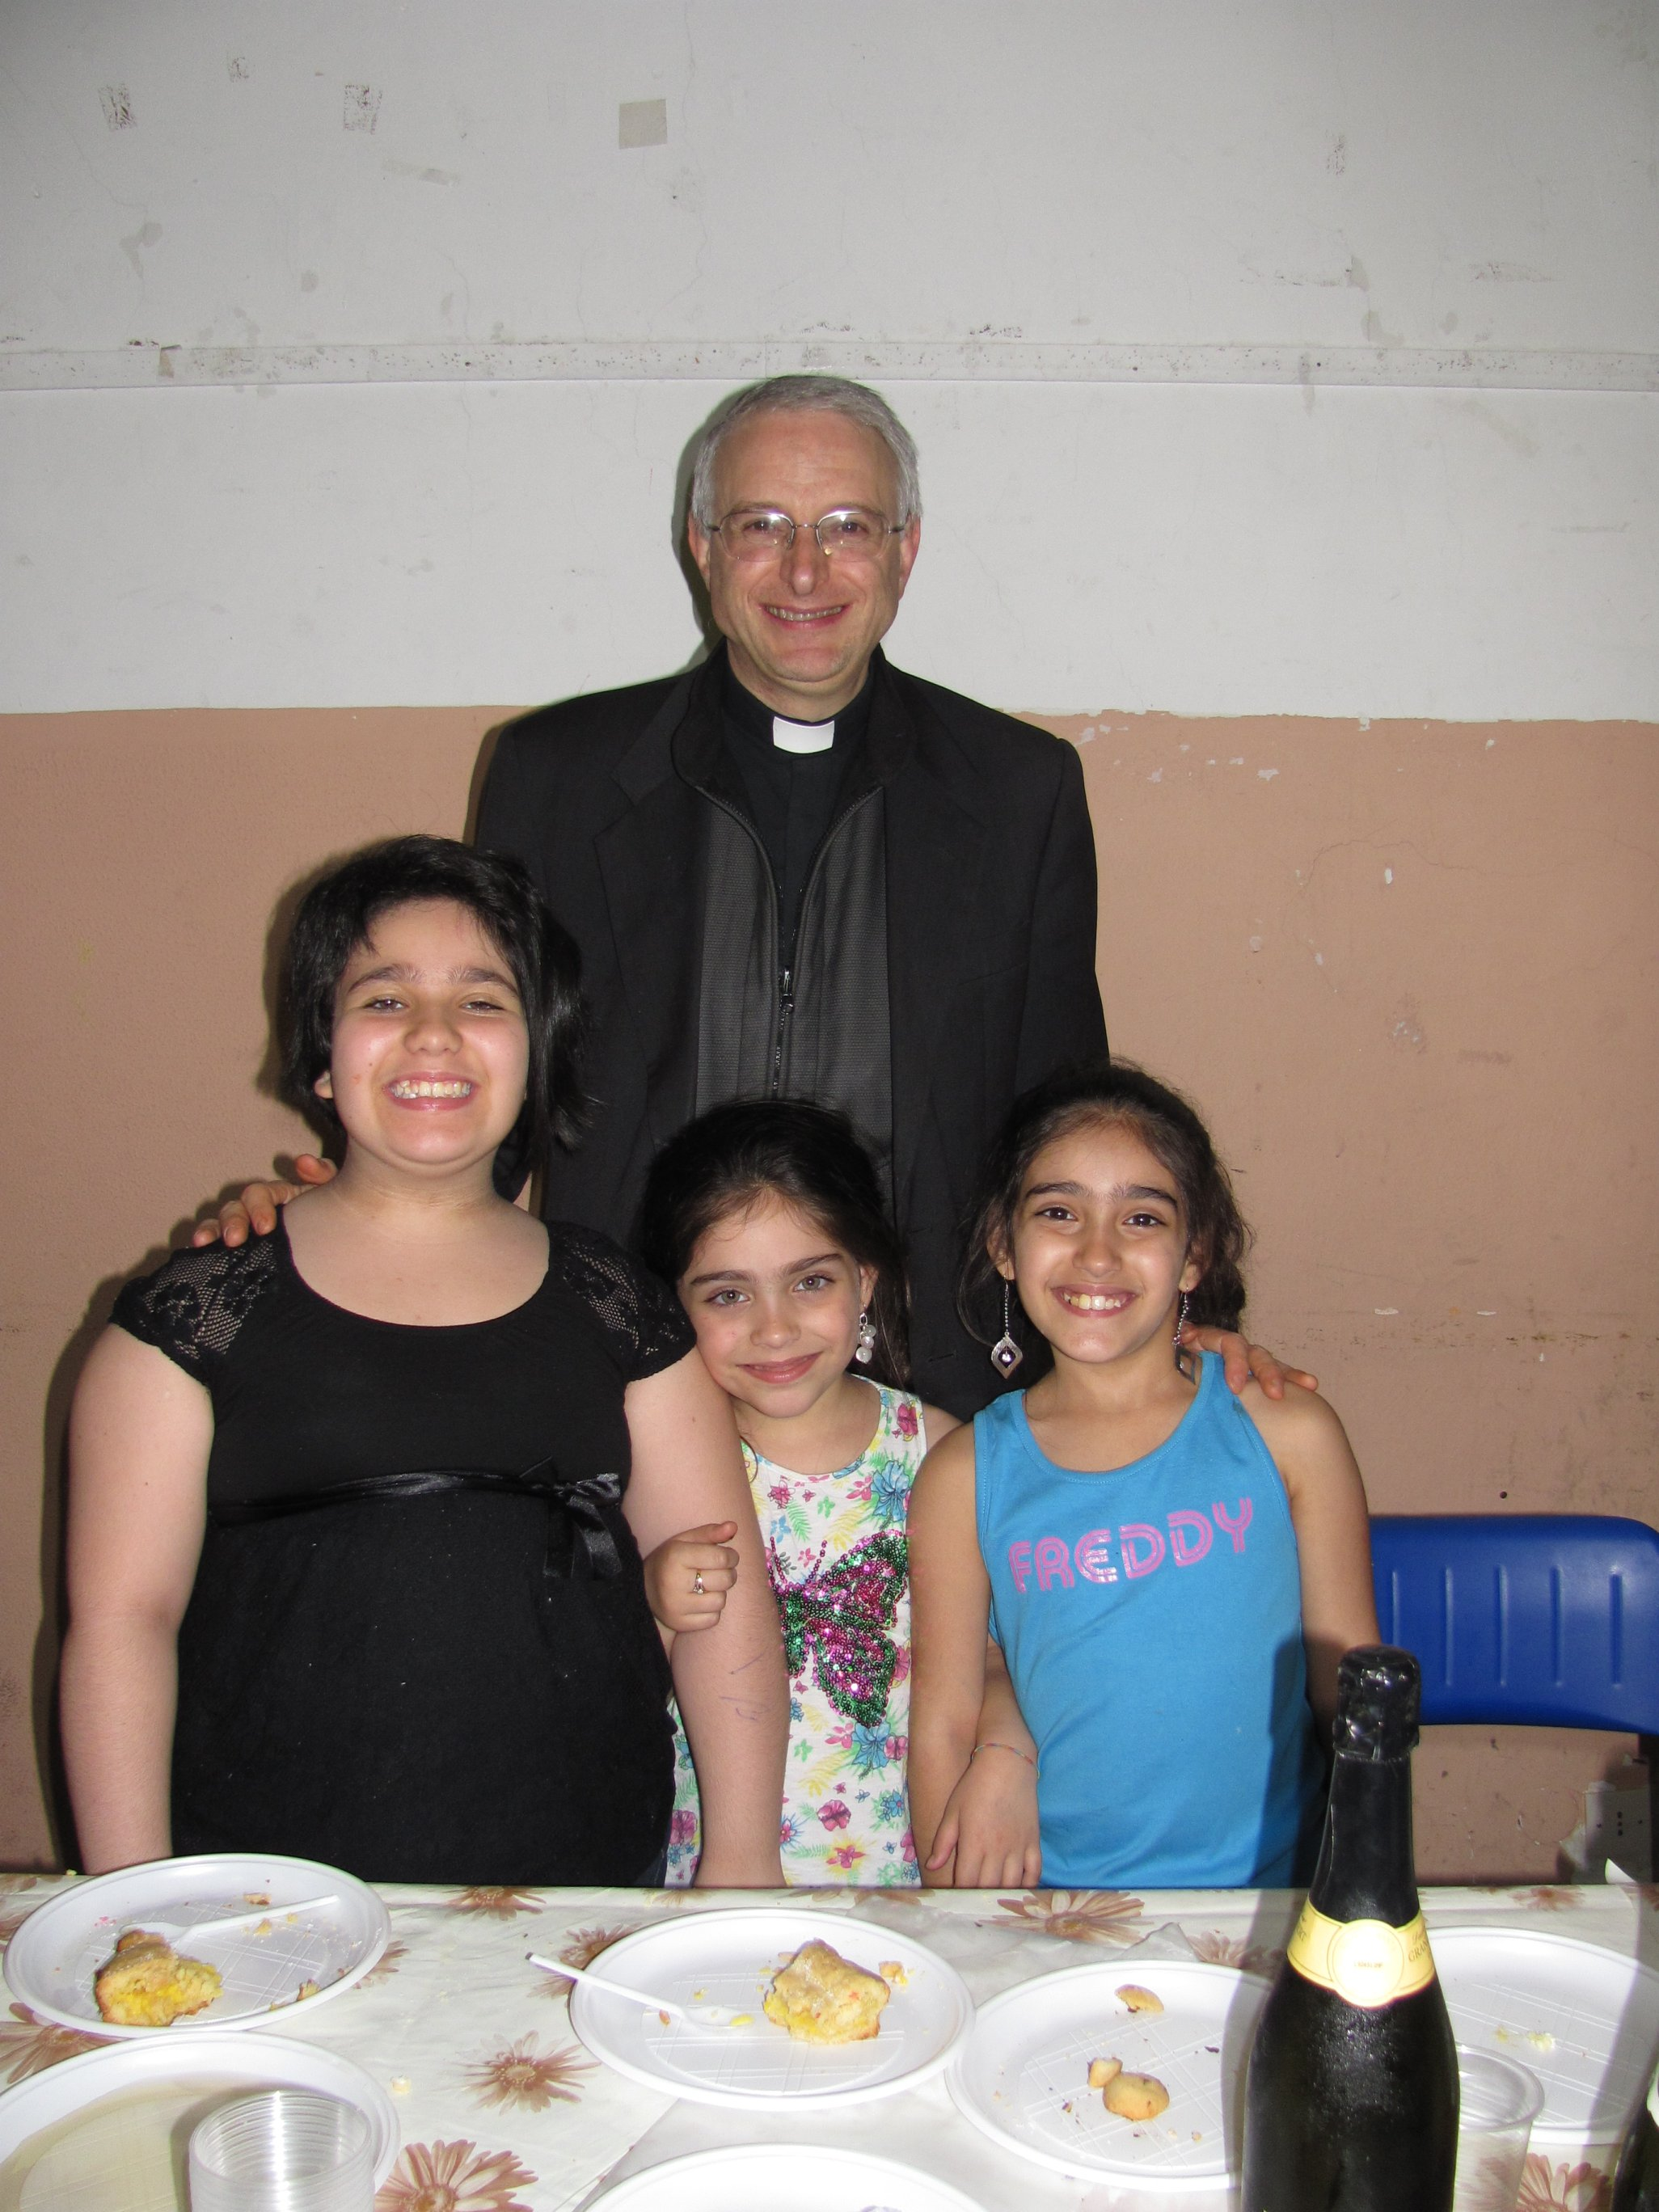 verifica_catechiste_2012-06-11-20-00-34